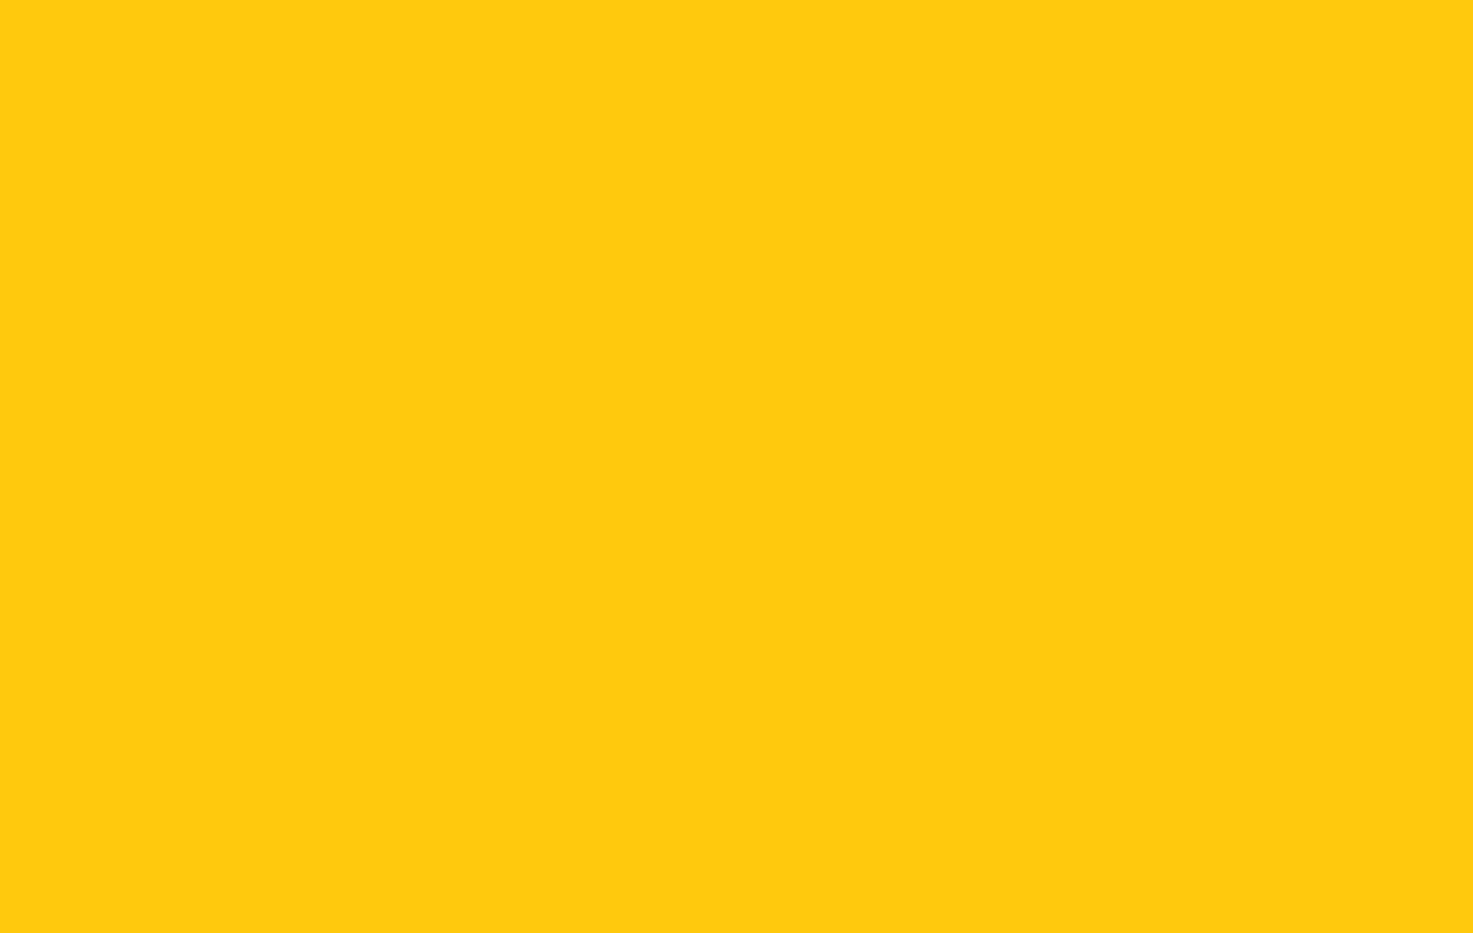 giallo sole 001